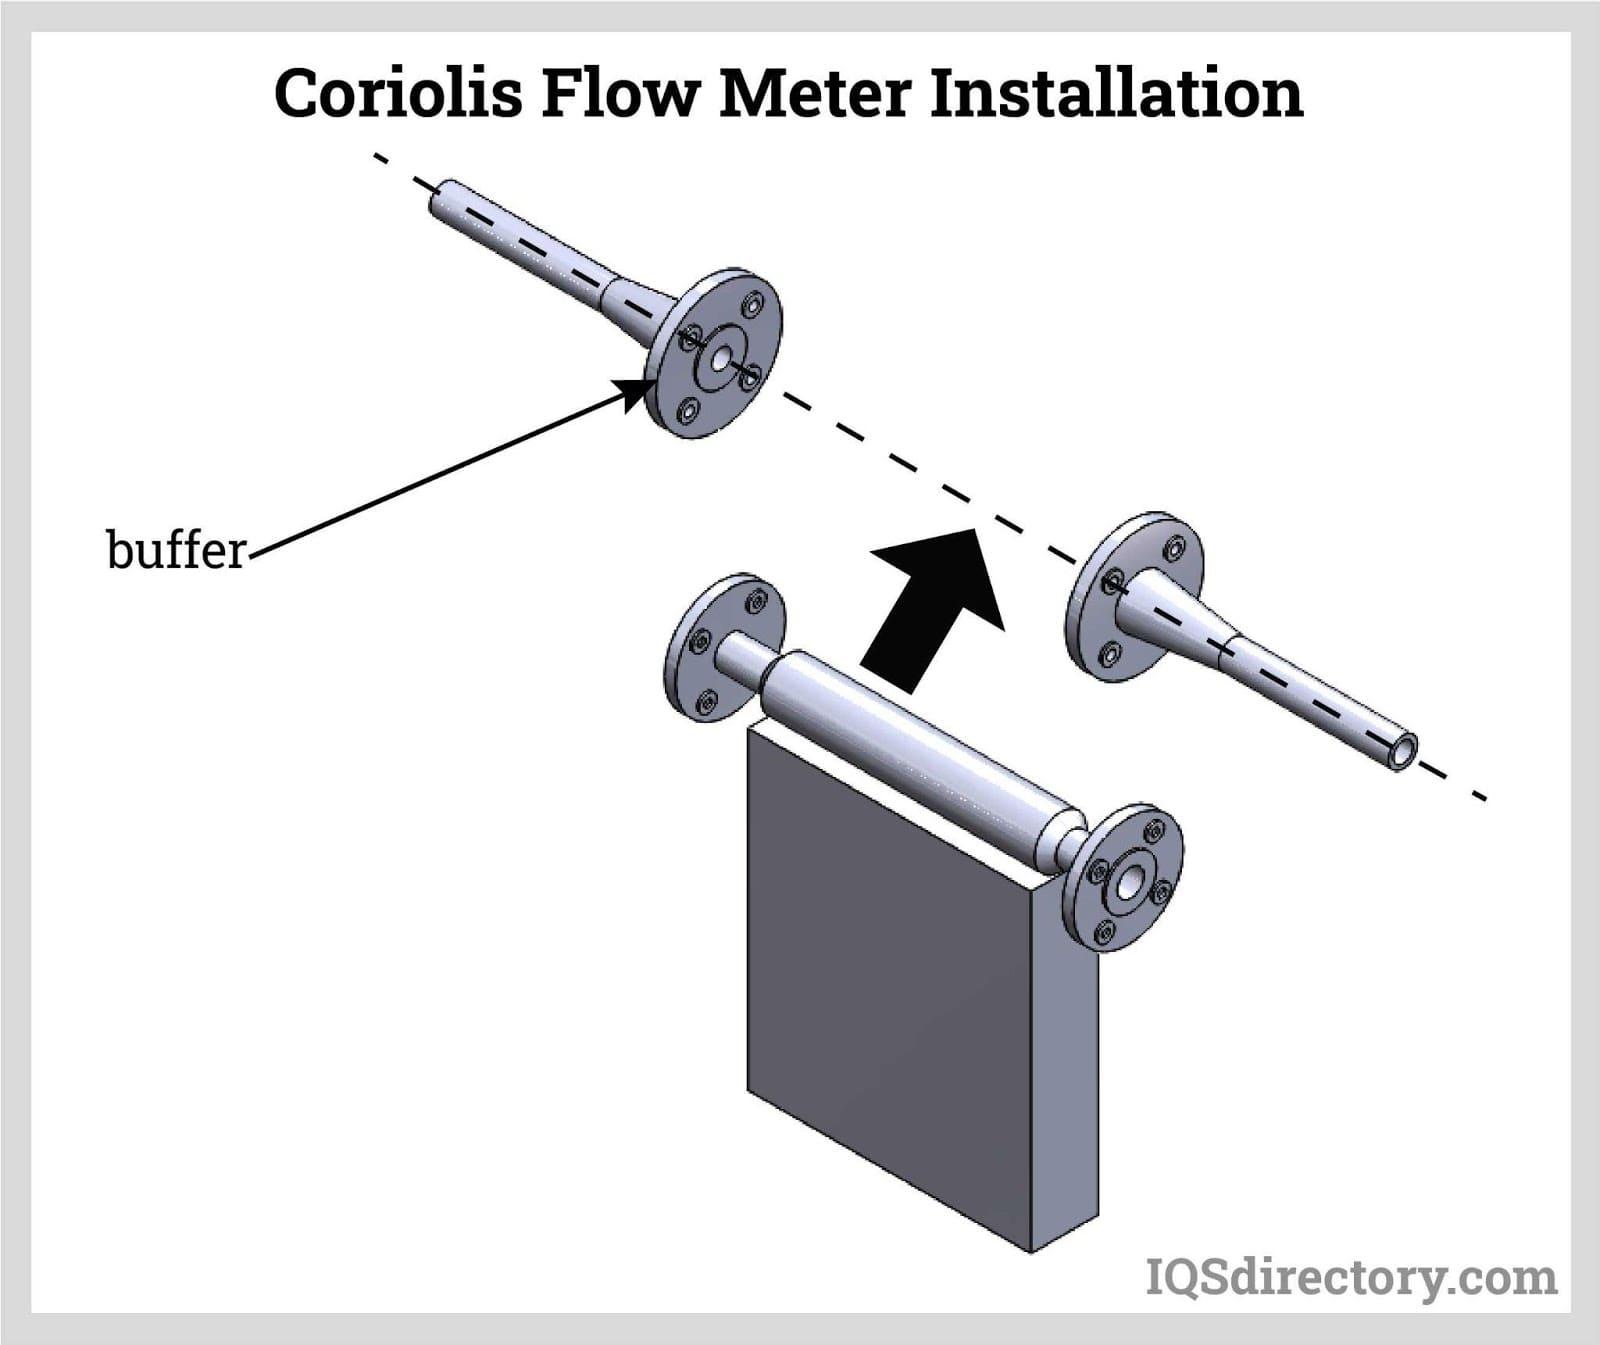 Coriolis Flow Meter Installation